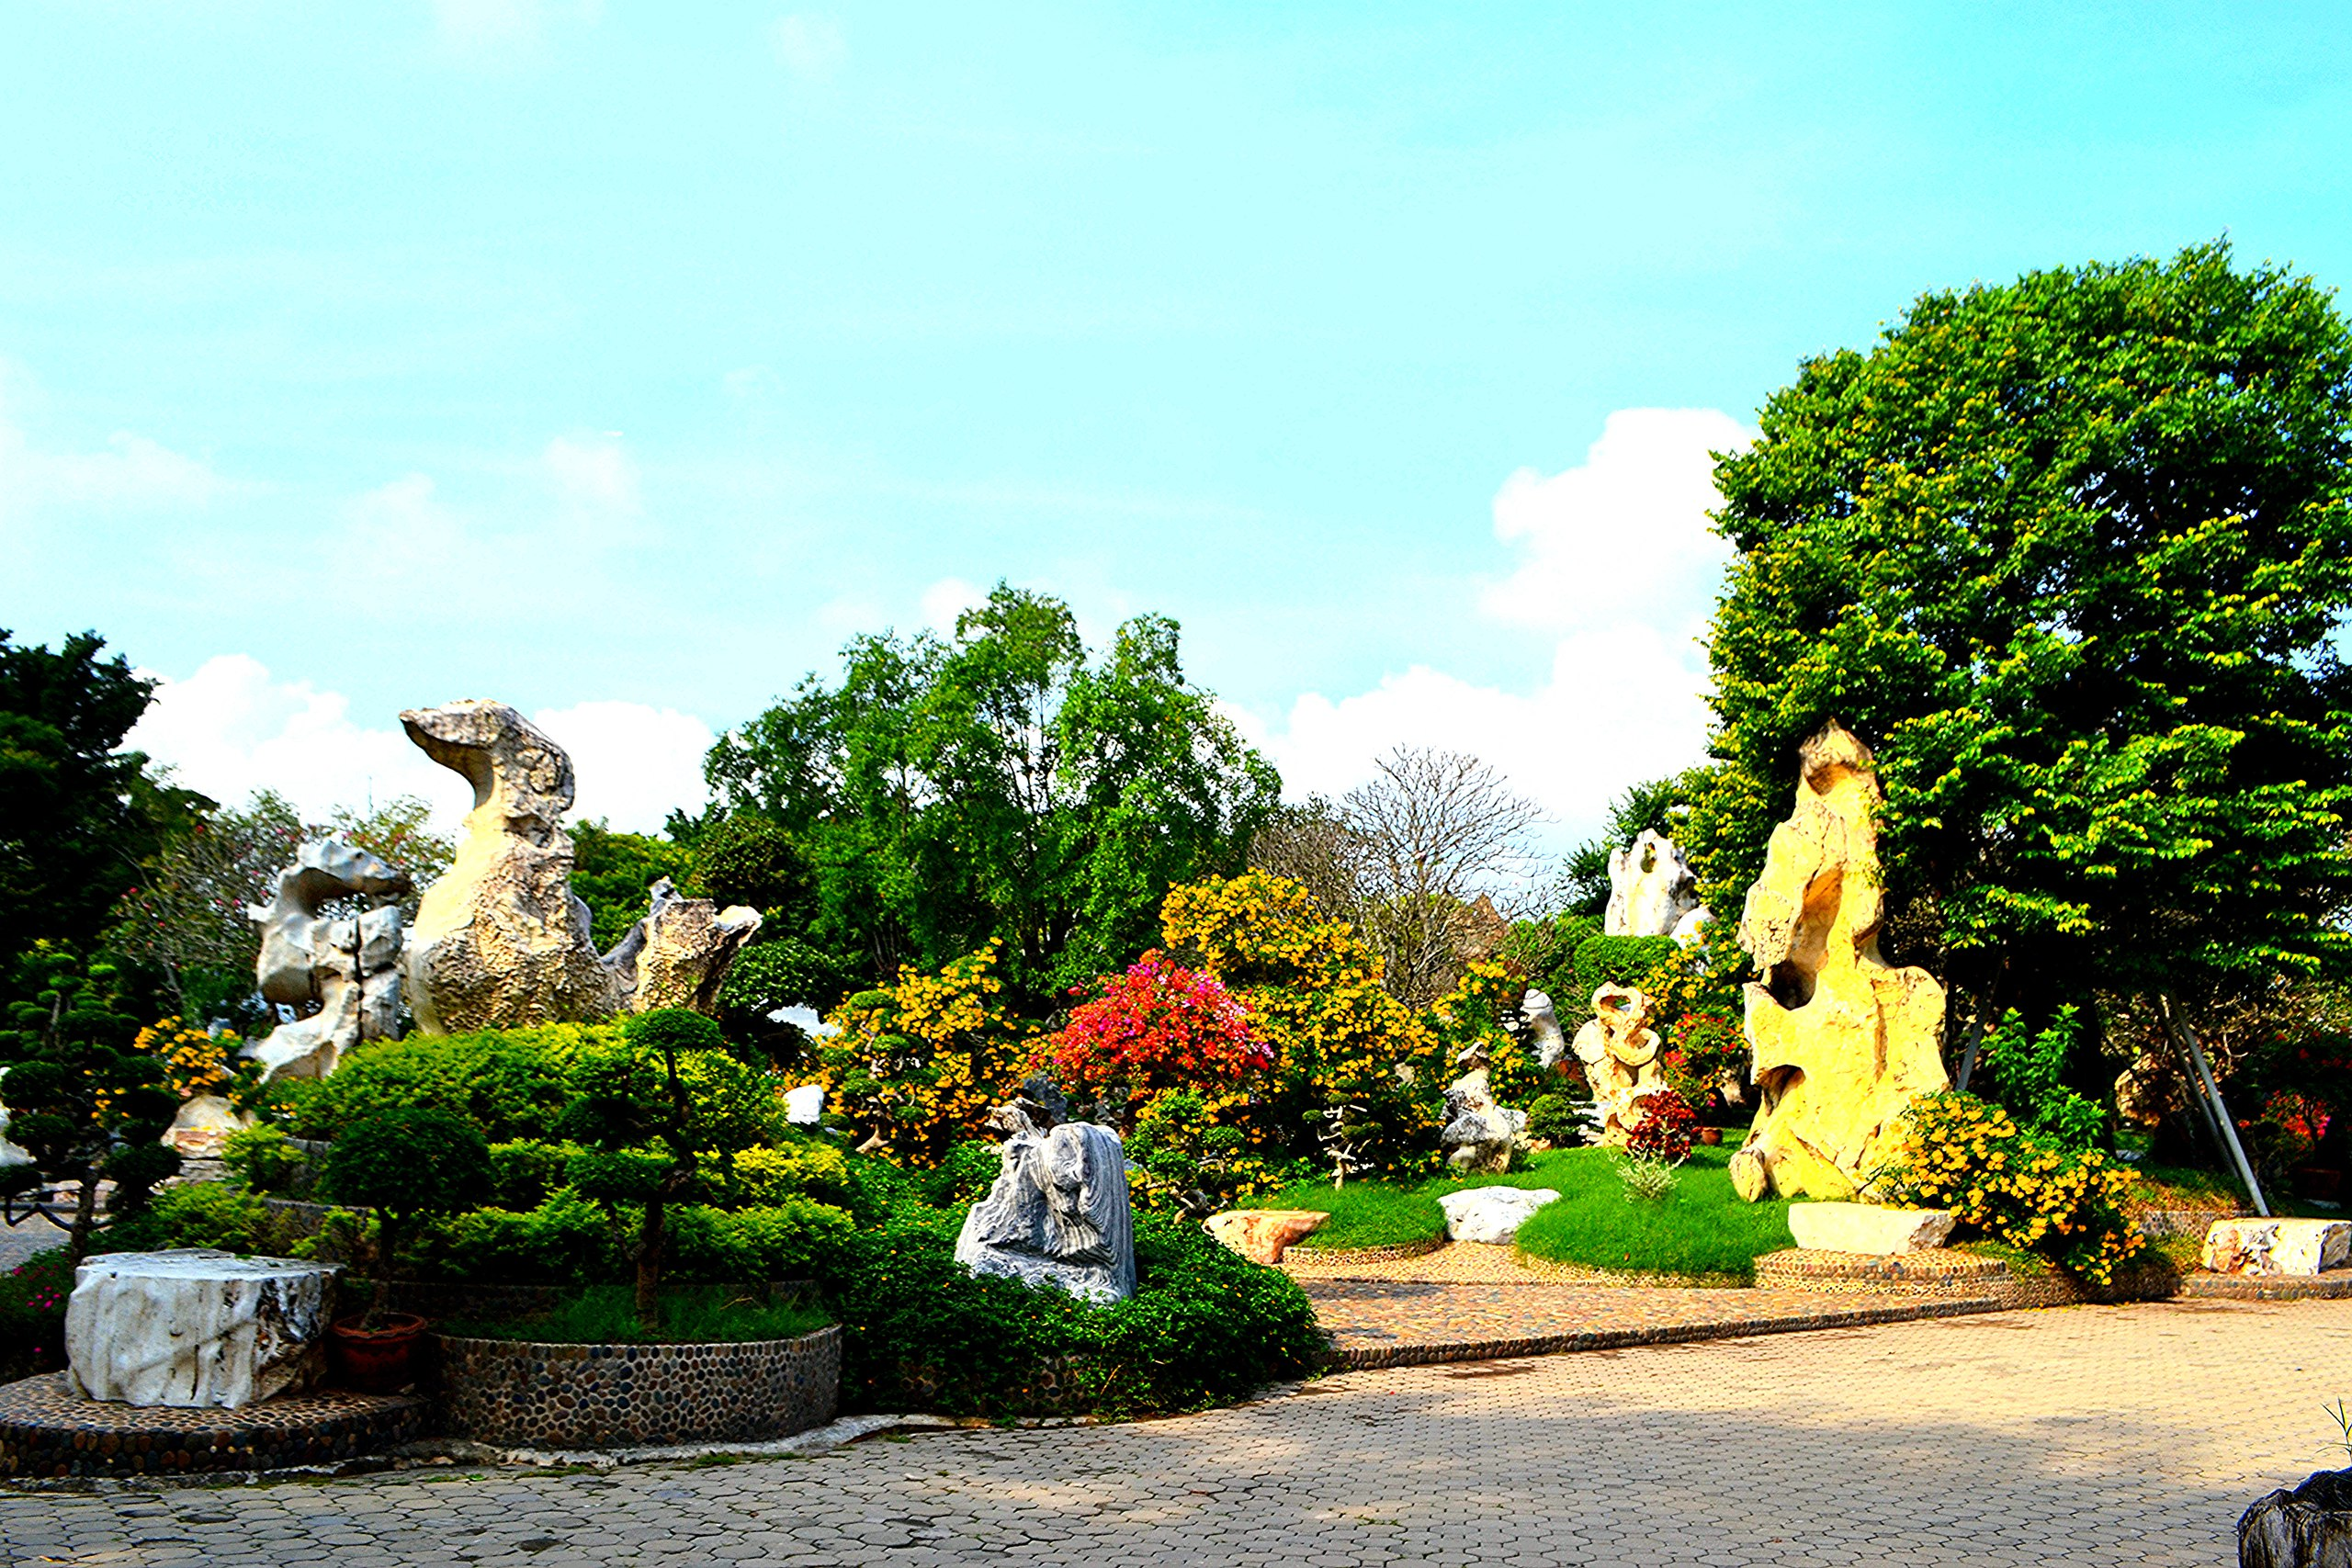 Елена Руденко ( Валтея ). Таиланд. Парк миллионолетних камней и крокодиловая ферма. _py1YRLYTrw